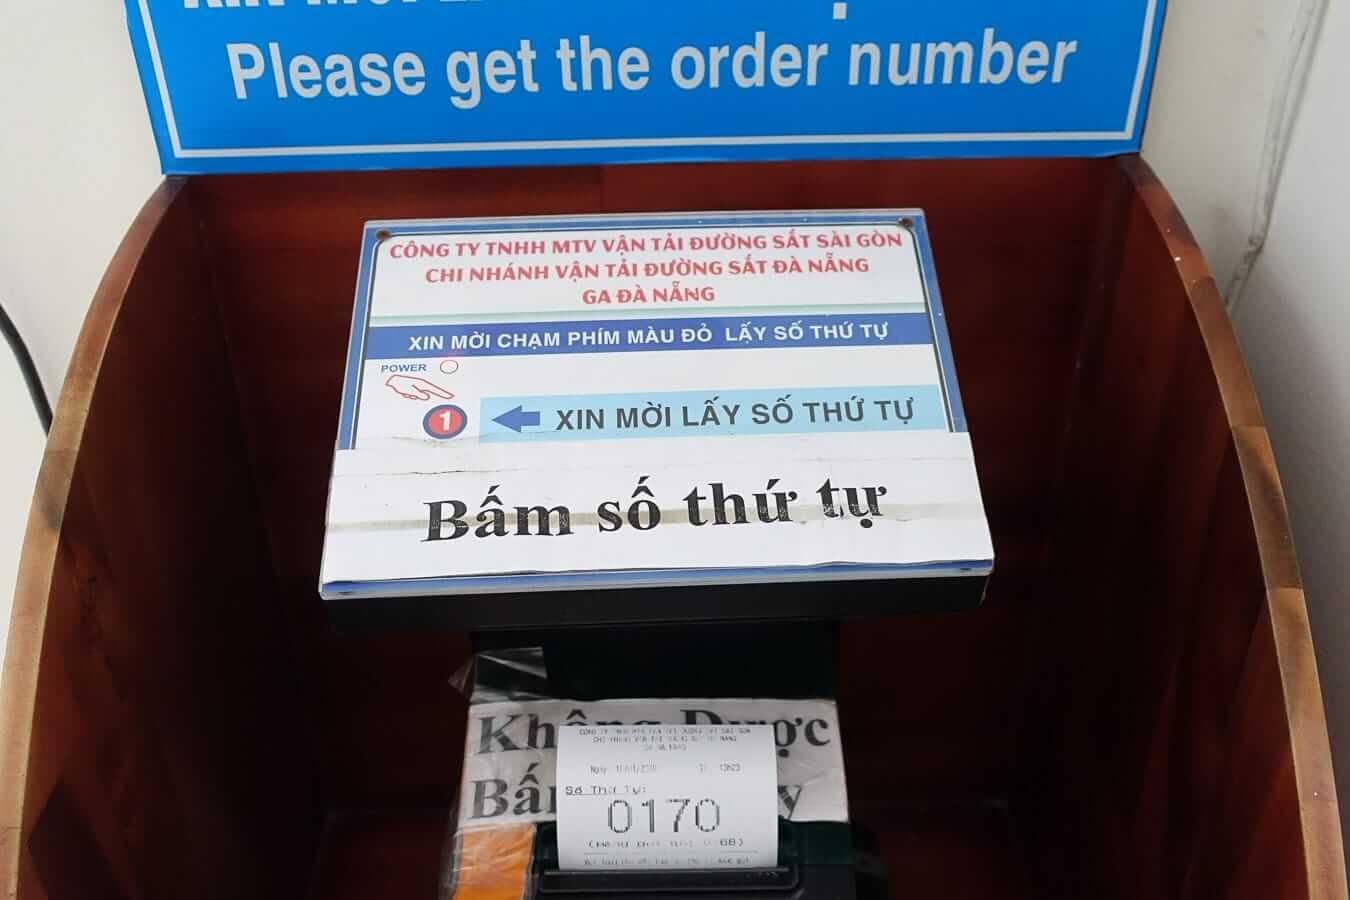 Da Nang train station ticket machine